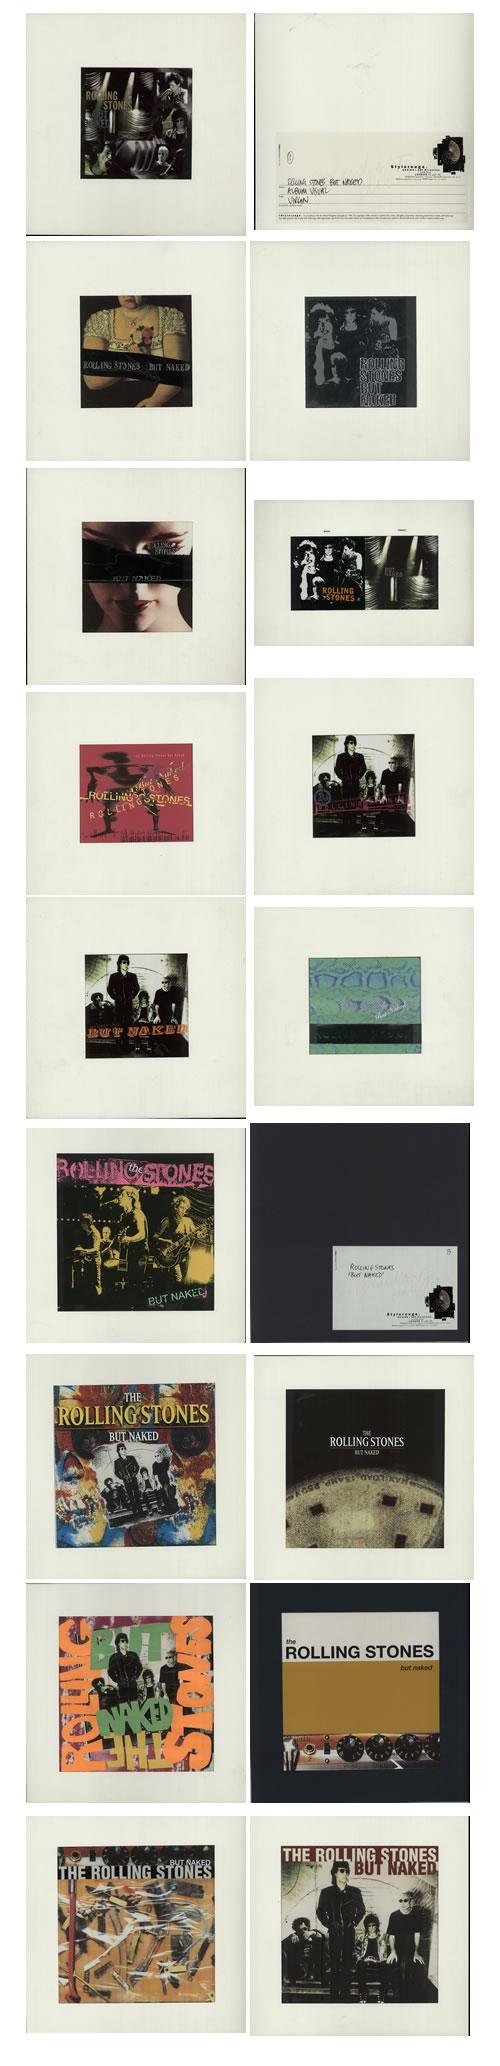 Rolling Stones But Naked - Unreleased artwork UK ROLARBU635831